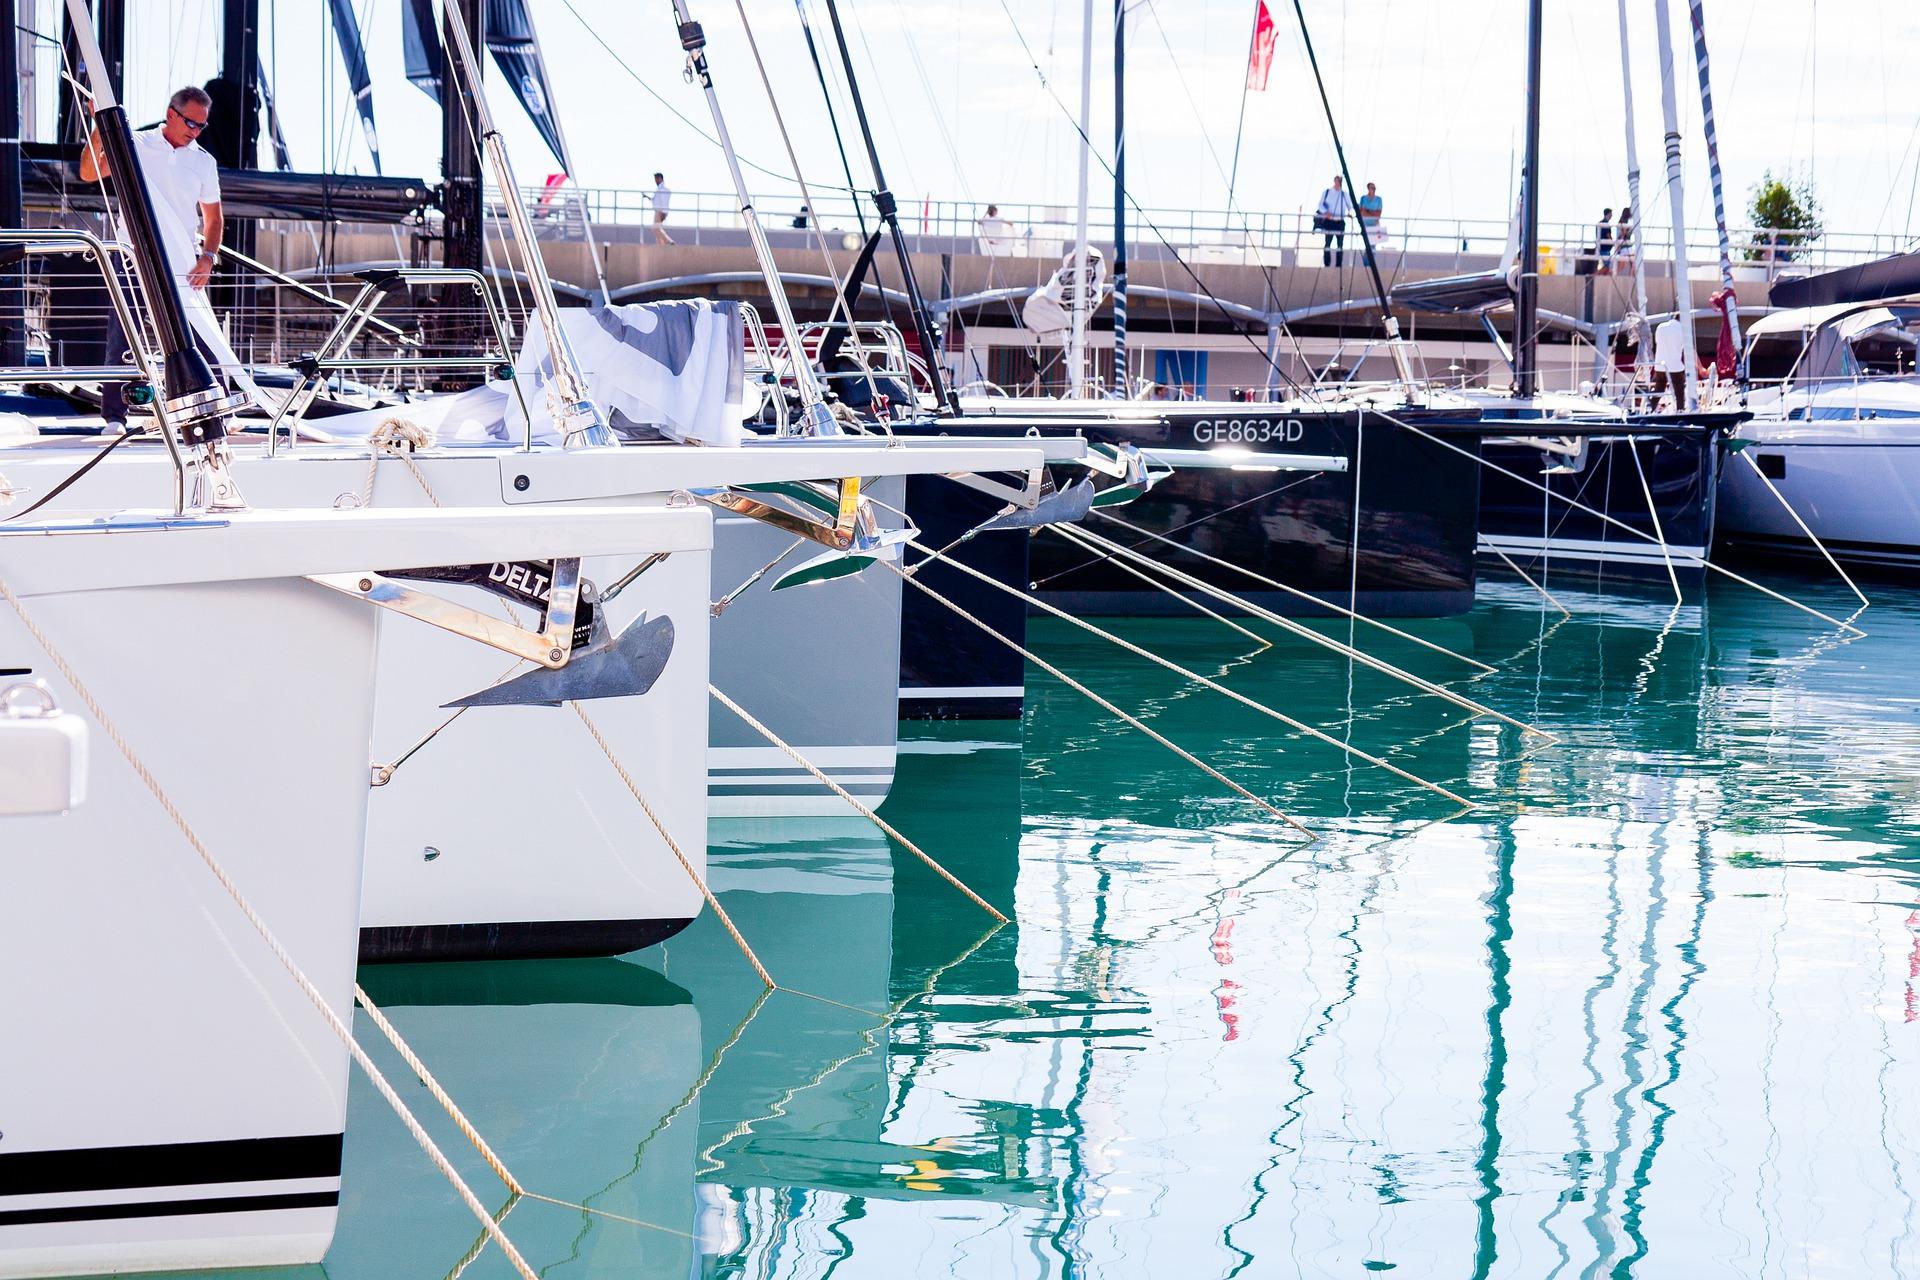 Amarre de veleros antes de salir a navegar